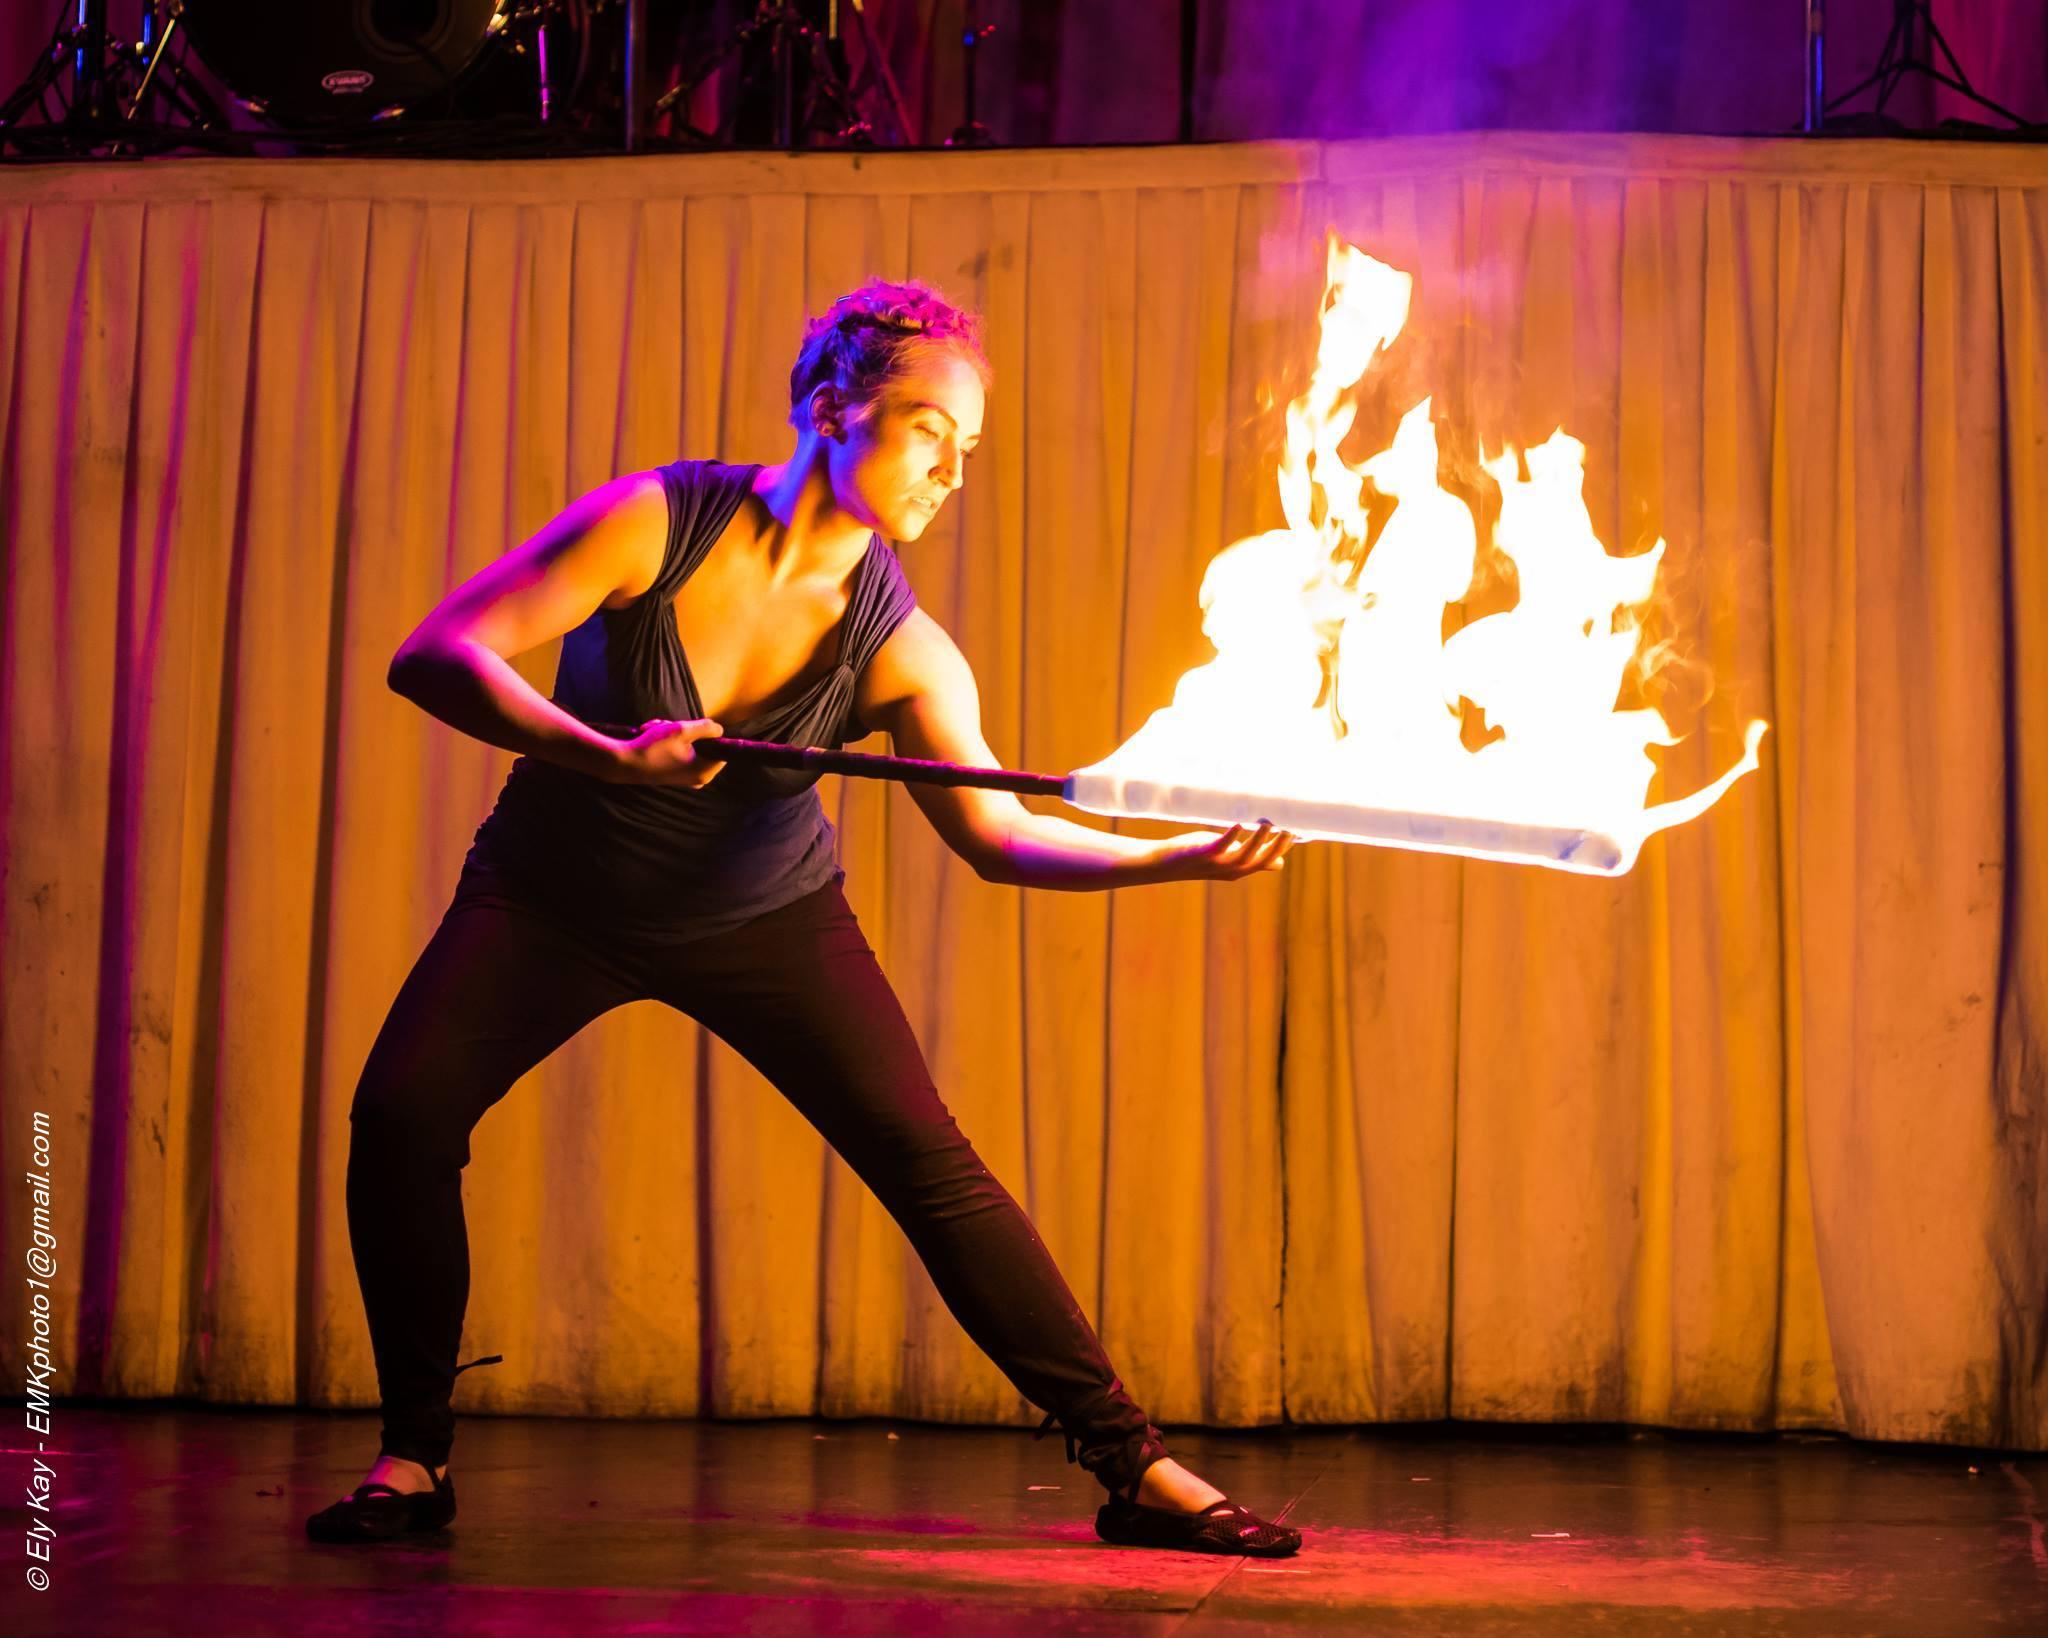 Beginner Fire Fan series with Tara McManus